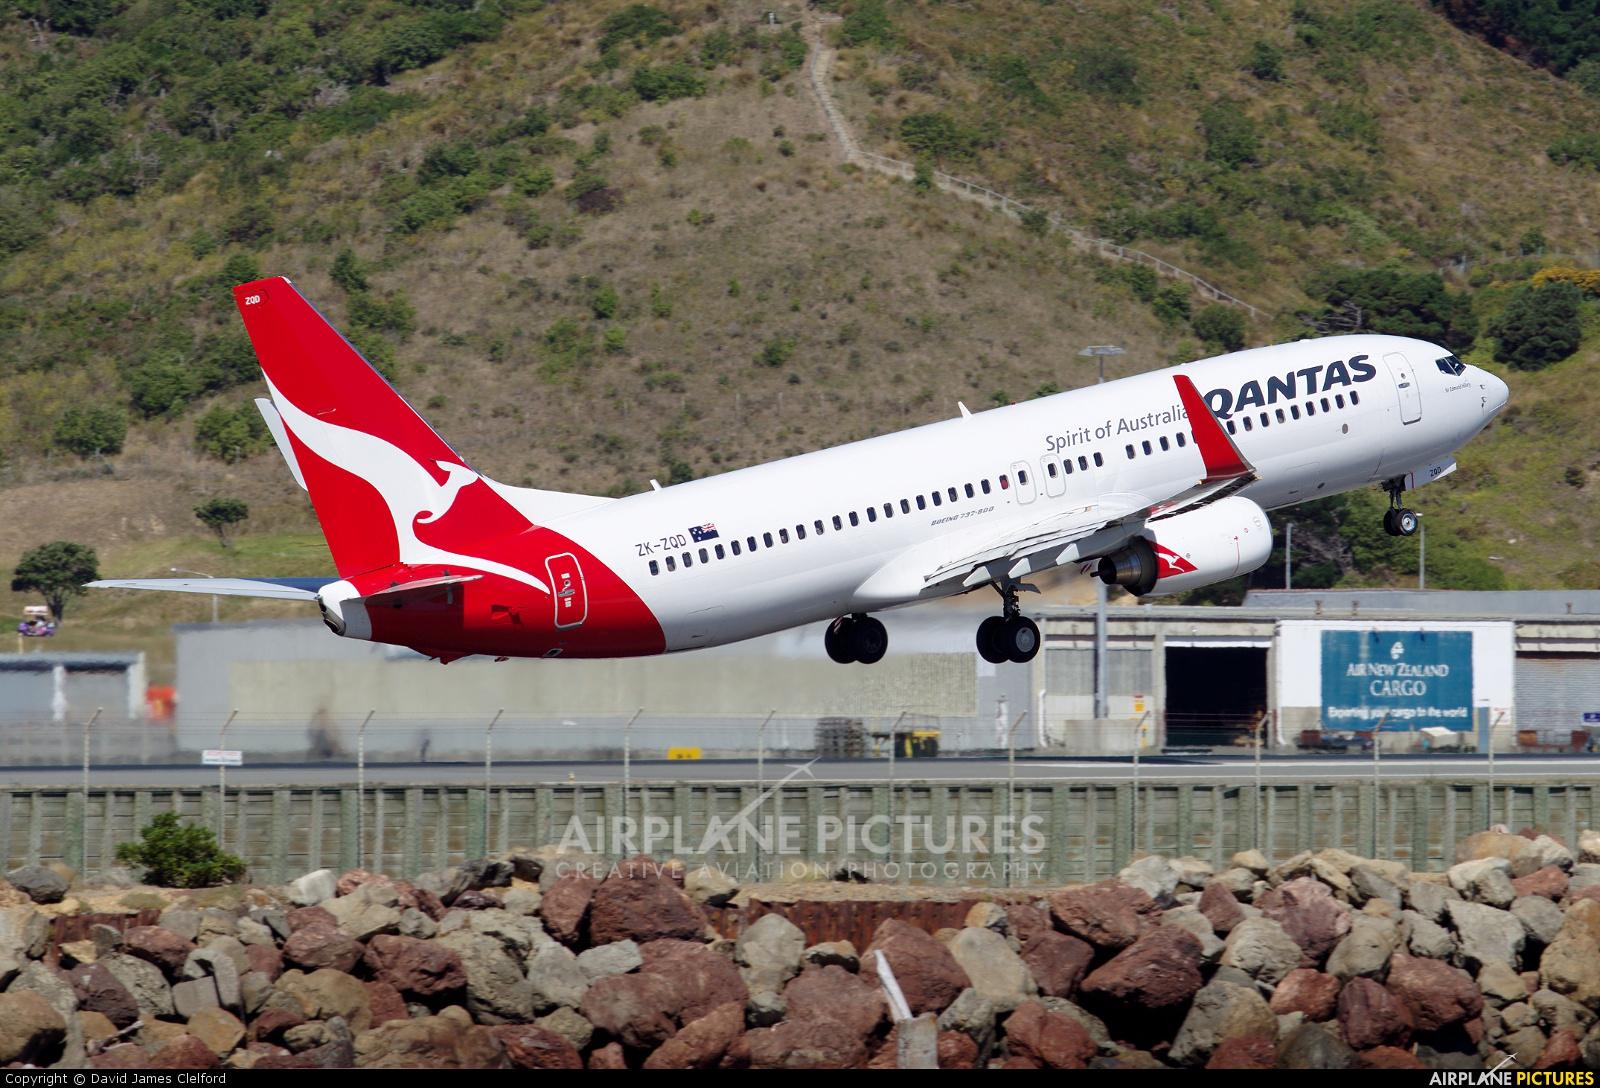 QANTAS ZK-ZQD aircraft at Wellington Intl